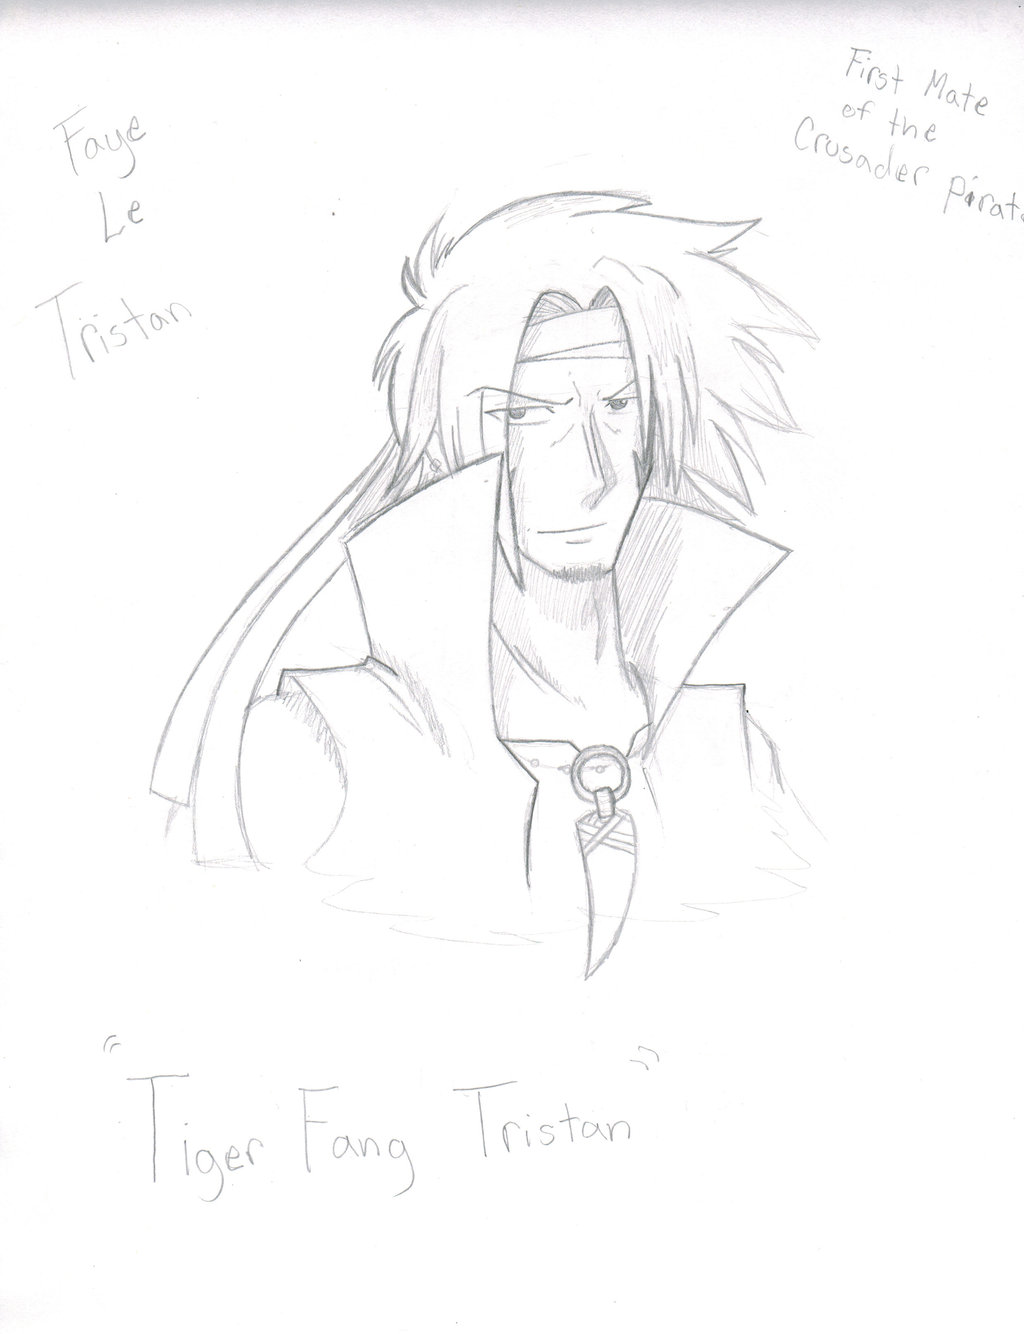 1024x1334 Tiger Claw Tristan Faye Le Tristan By Proxamina